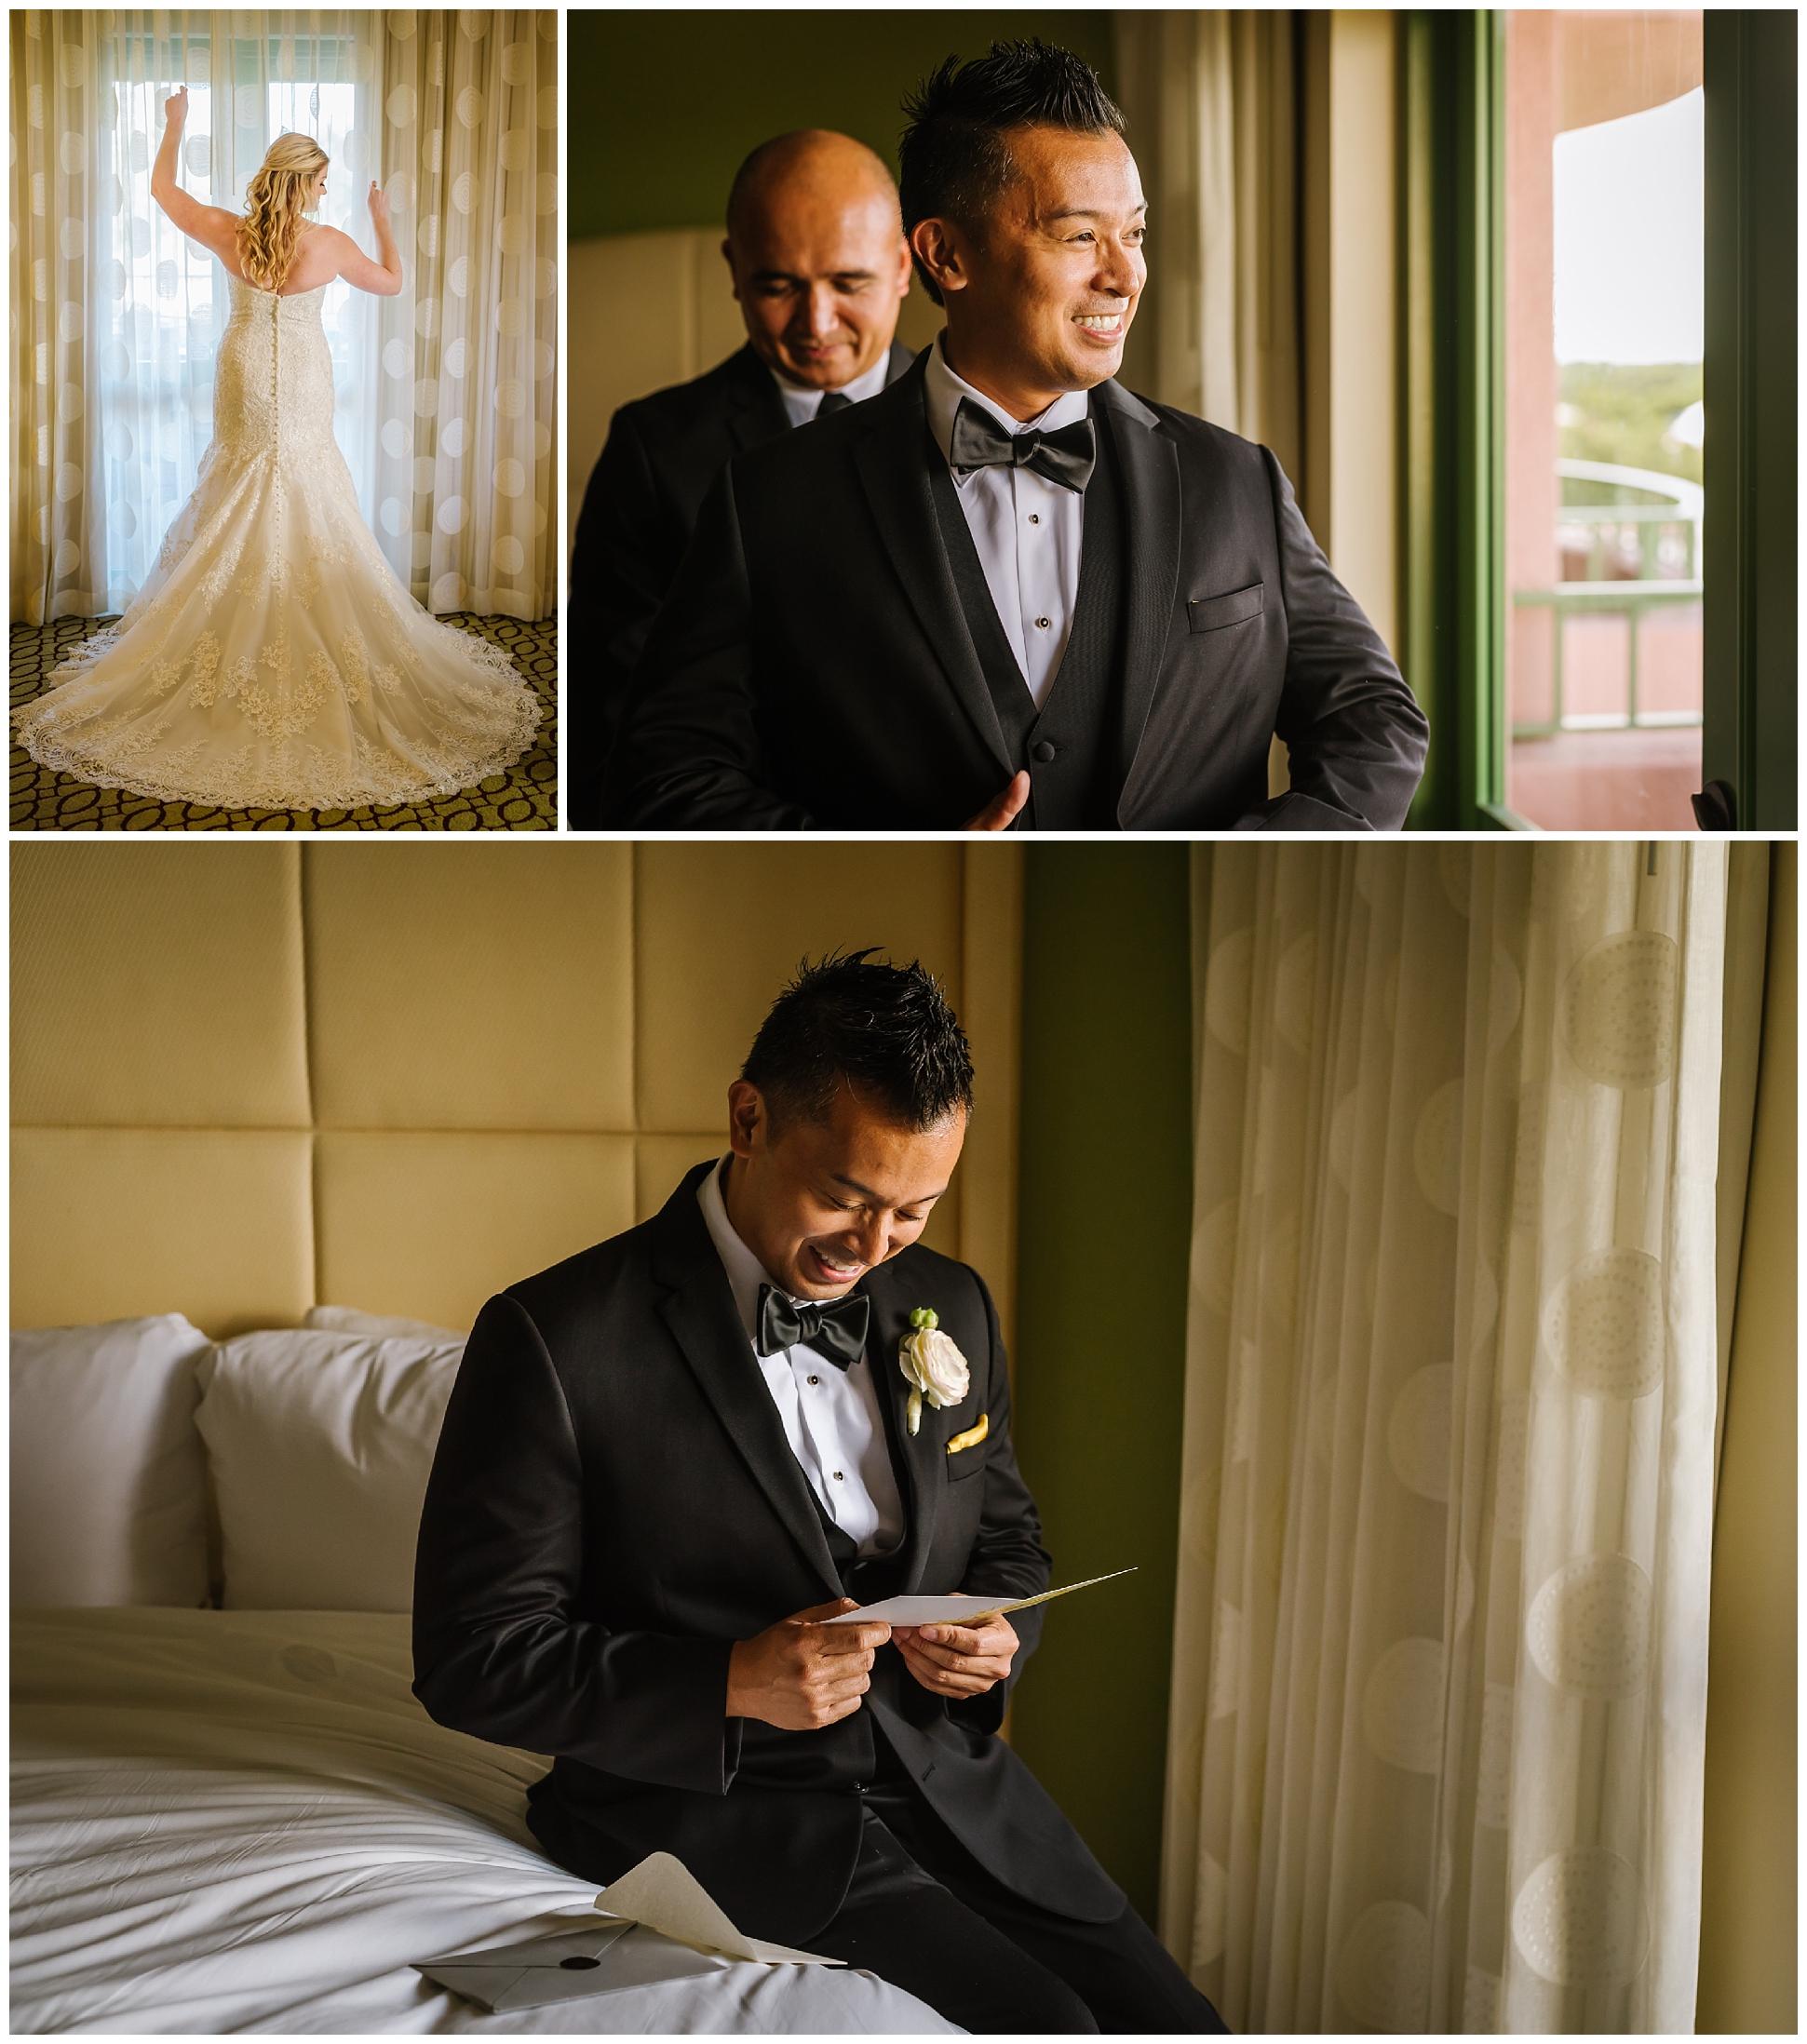 Ashlee-hamon-photography-year-in-review-2016-travel-wanderlust-vsco-adventure-wedding_0092.jpg